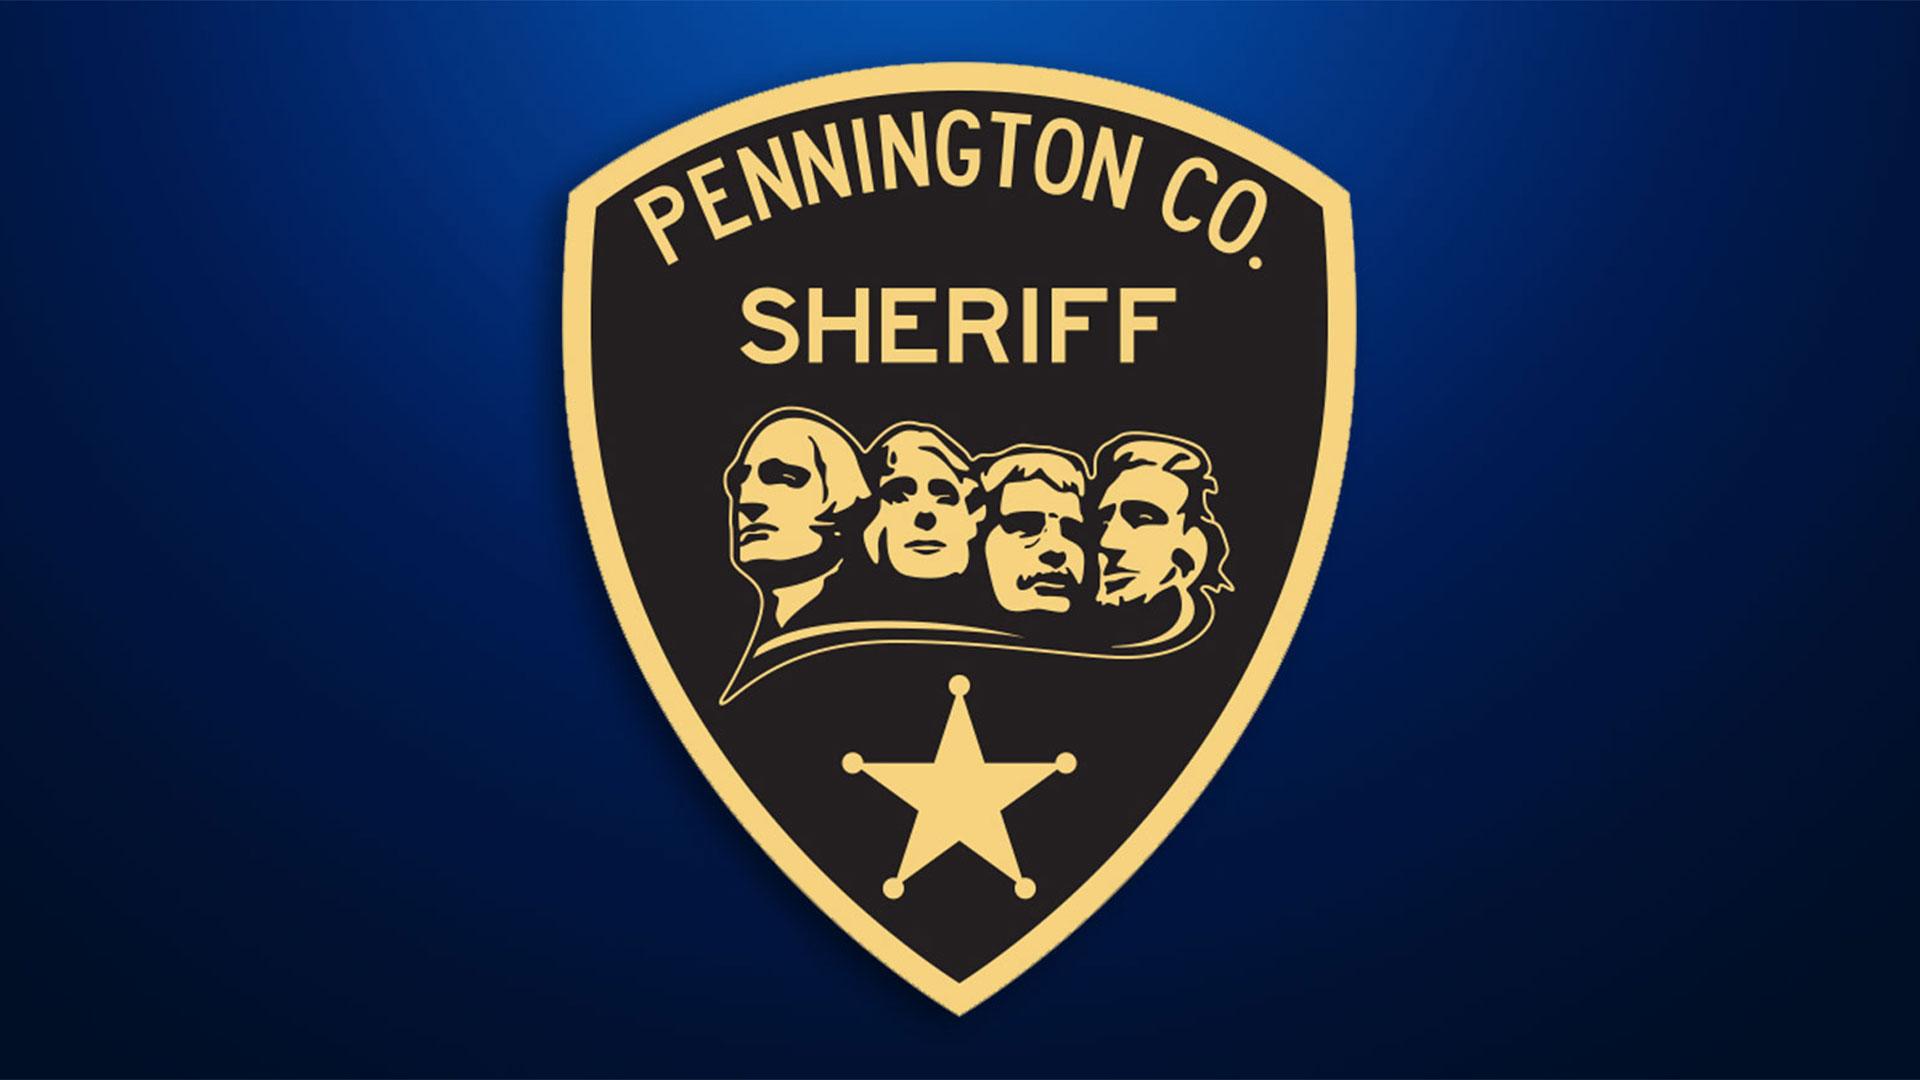 KELO Pennington County Sheriff